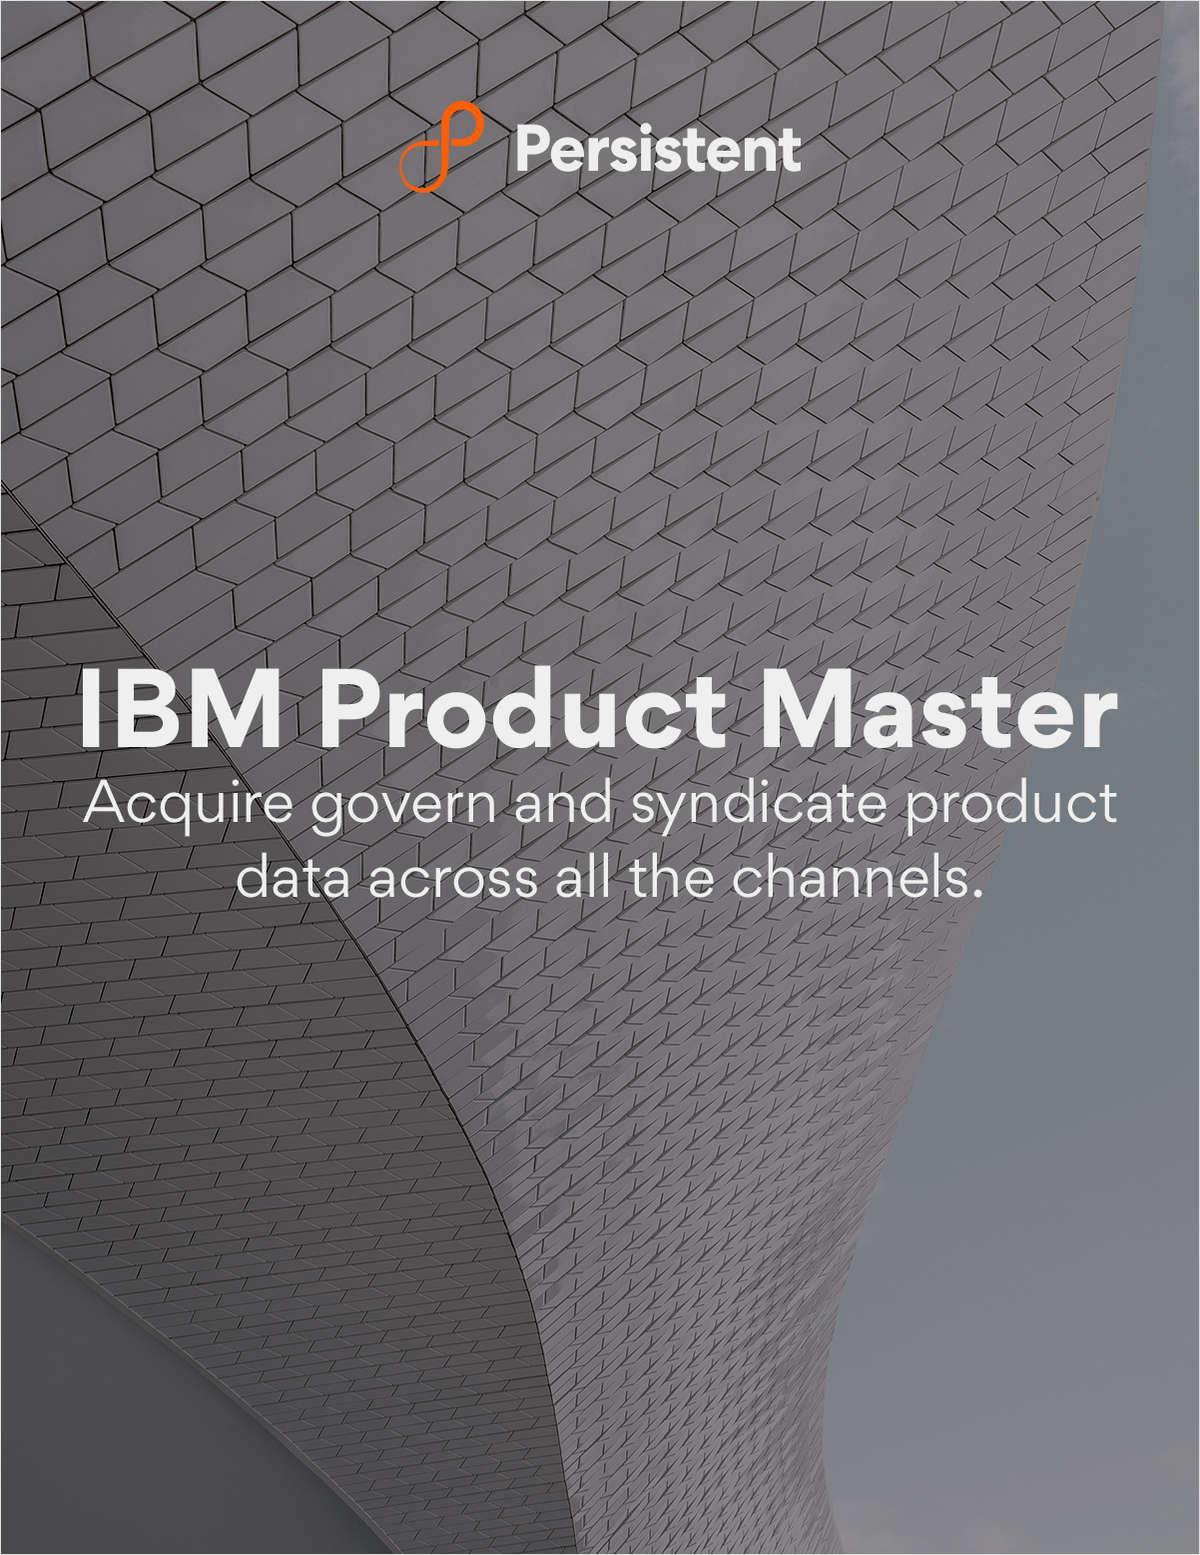 IBM Product Master